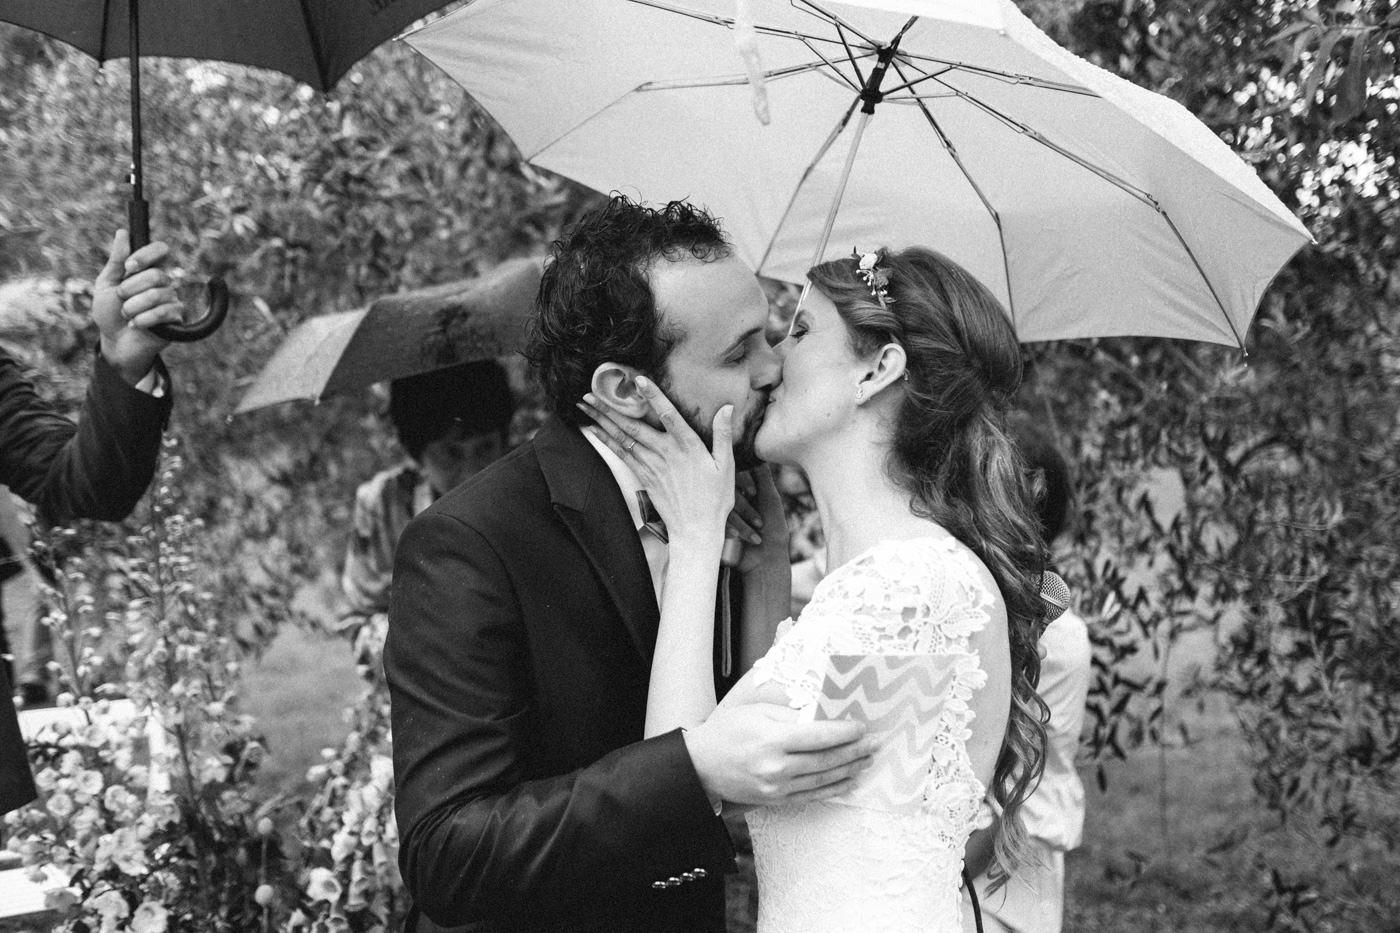 matrimoni_all_italiana_fotografo_matrimonio_toscana-42.jpg